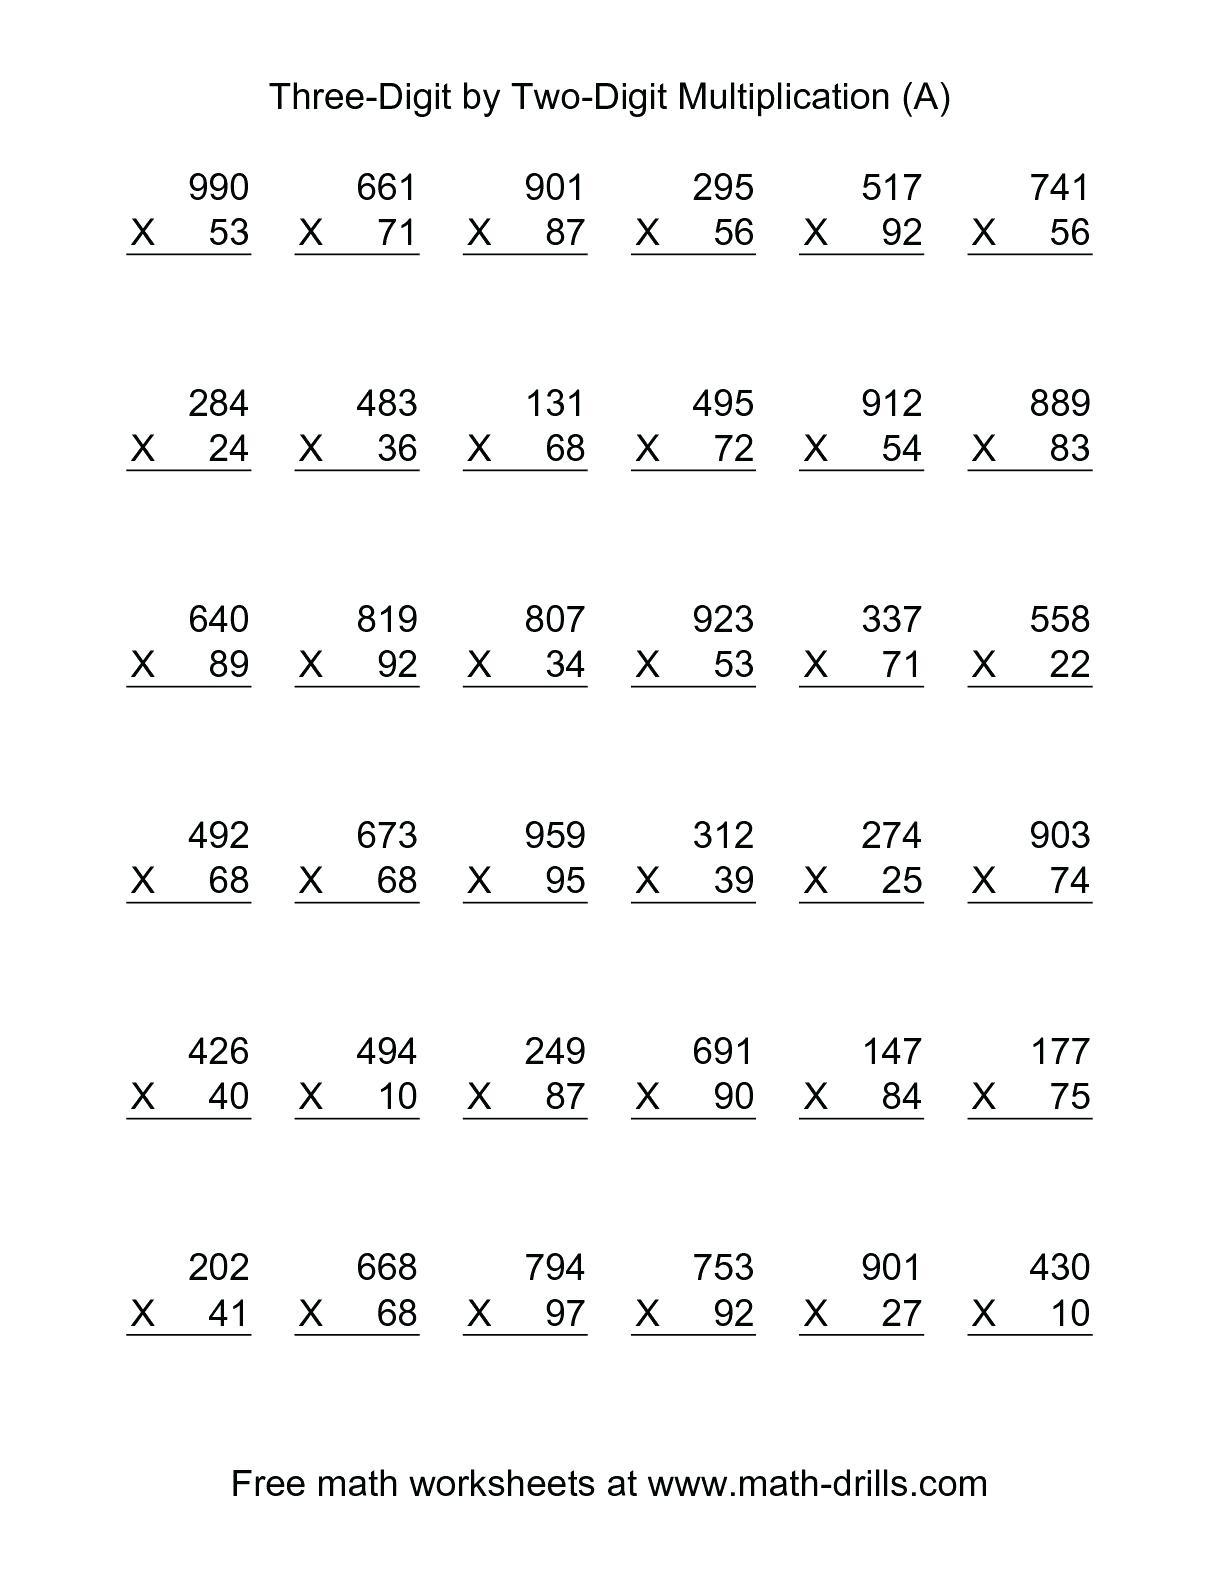 3 Digit1 Digit Multiplication Worksheets Math Similar Images For | 3 Digit By 1 Digit Multiplication Worksheets Printable